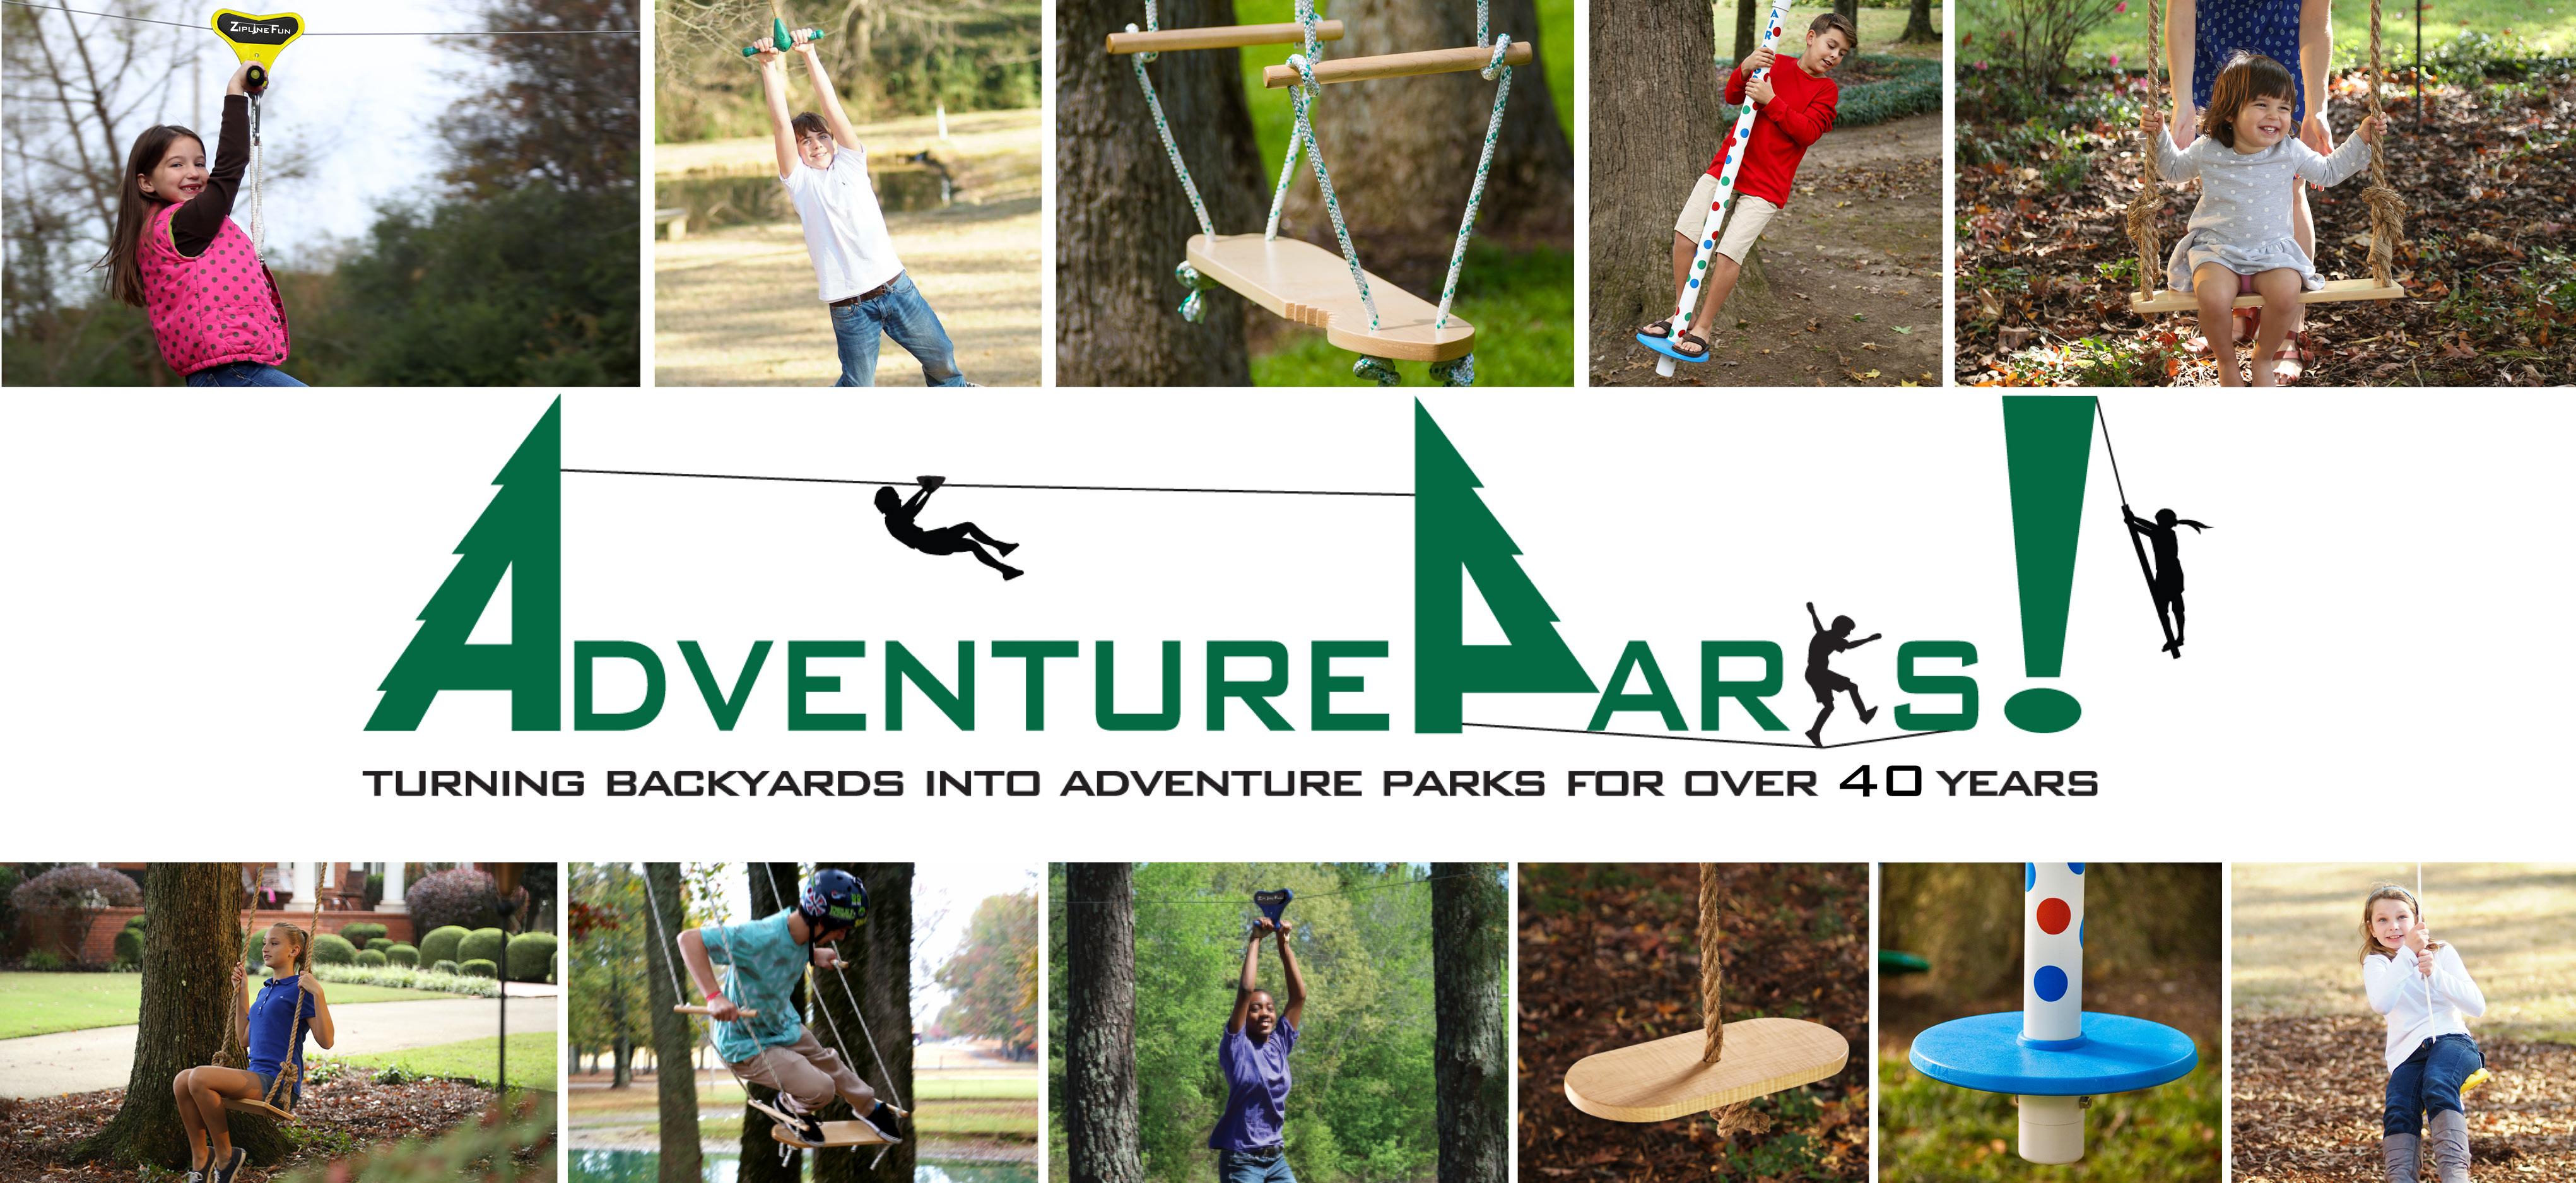 adventureparkswebsite.jpg